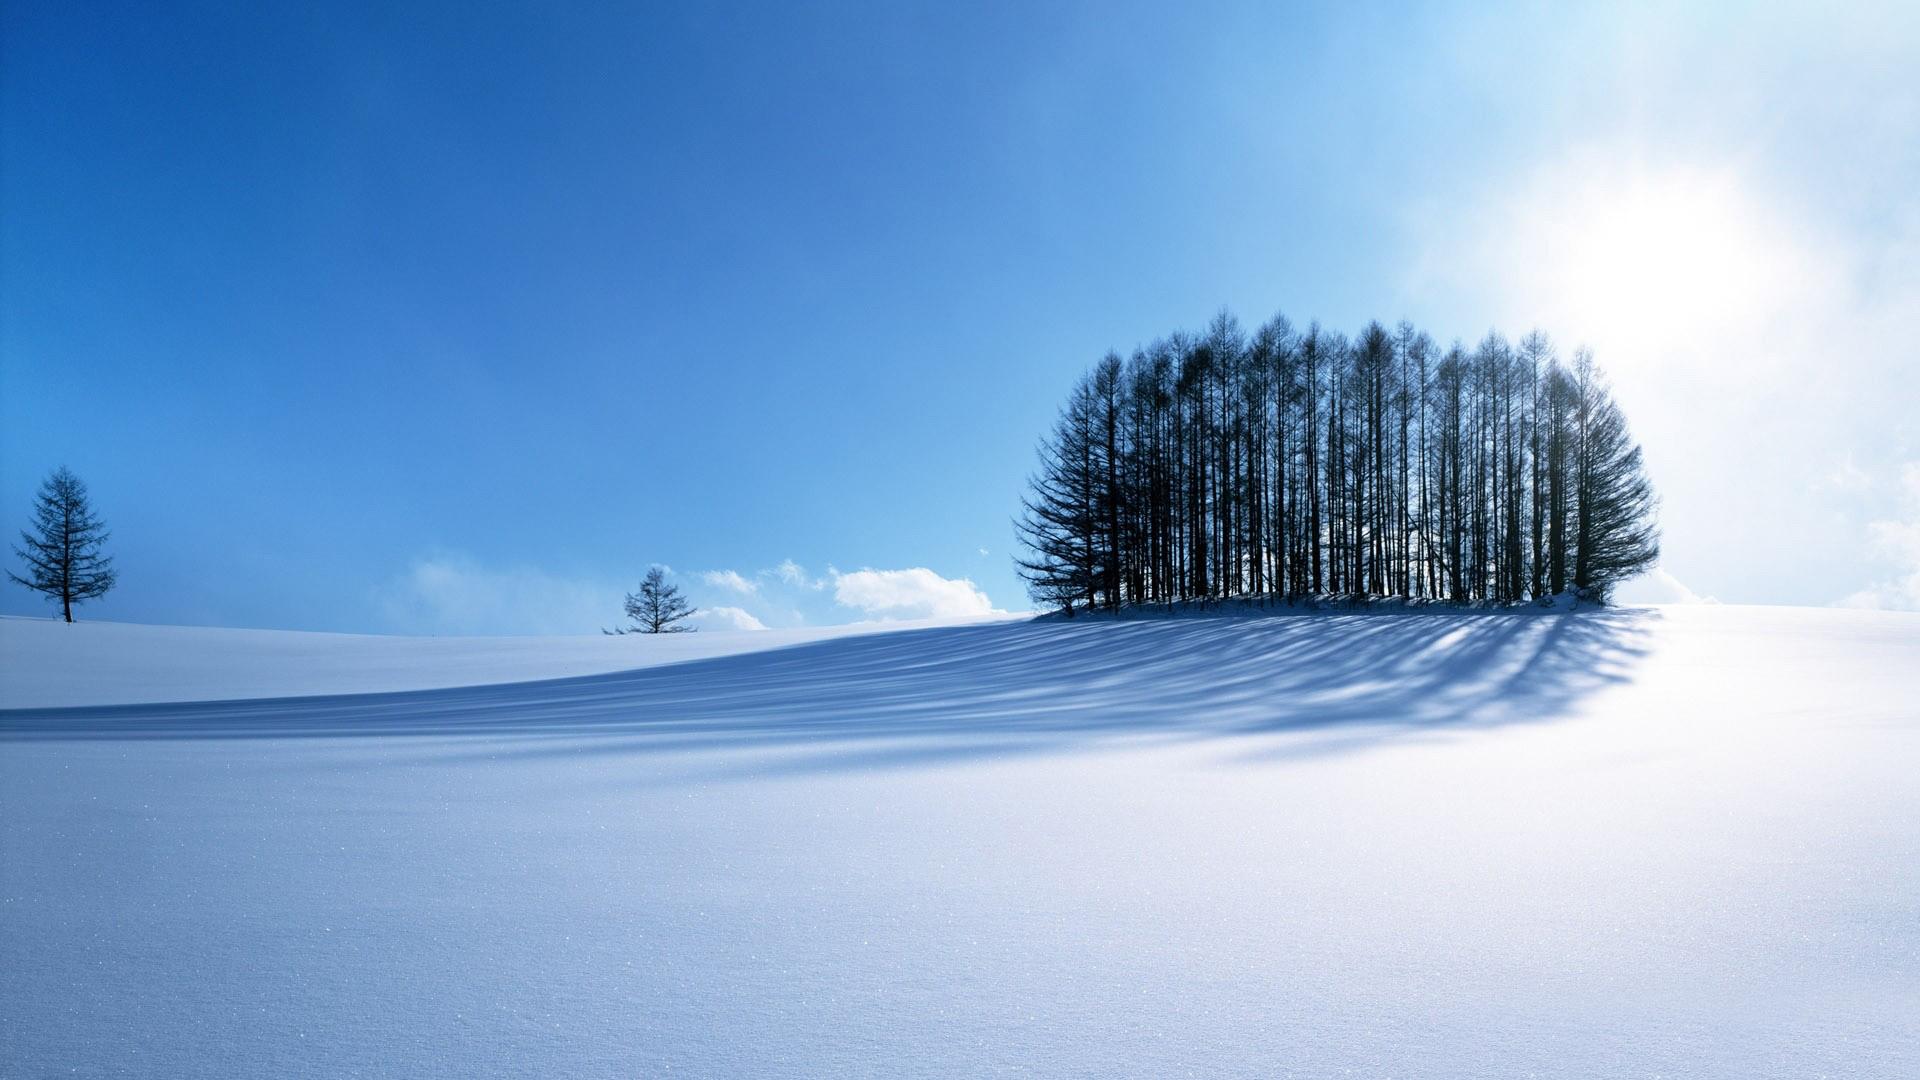 35 Beautiful HD Winter Wallpapers 1920x1080